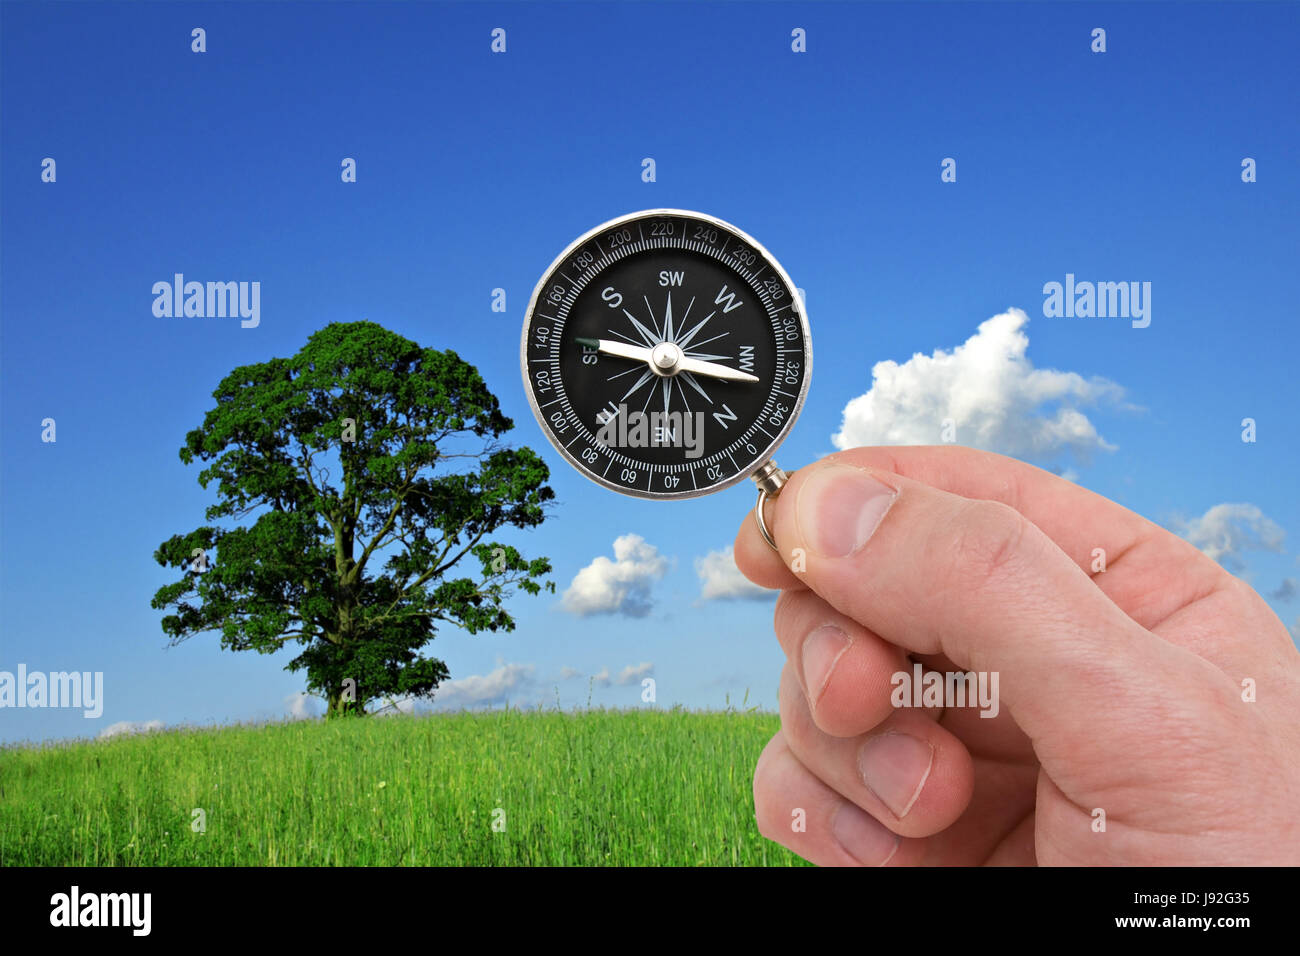 Voyage, aventure, orientation, cartographie, paysan, rural, nature, boussole, Photo Stock